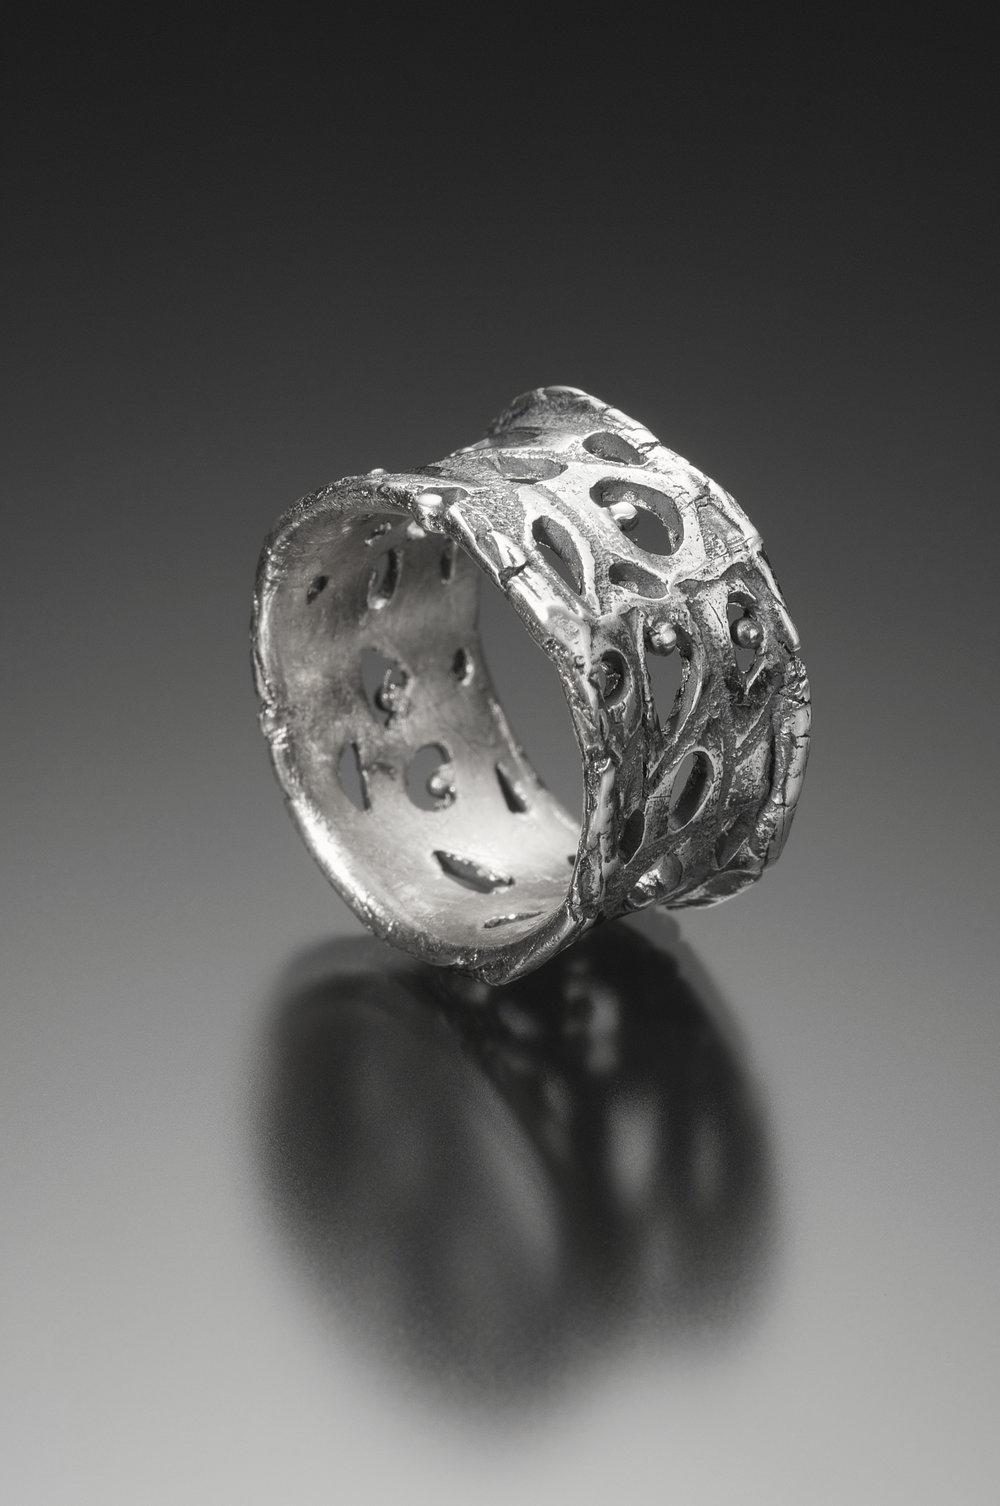 Pierced_Ring copy.jpg